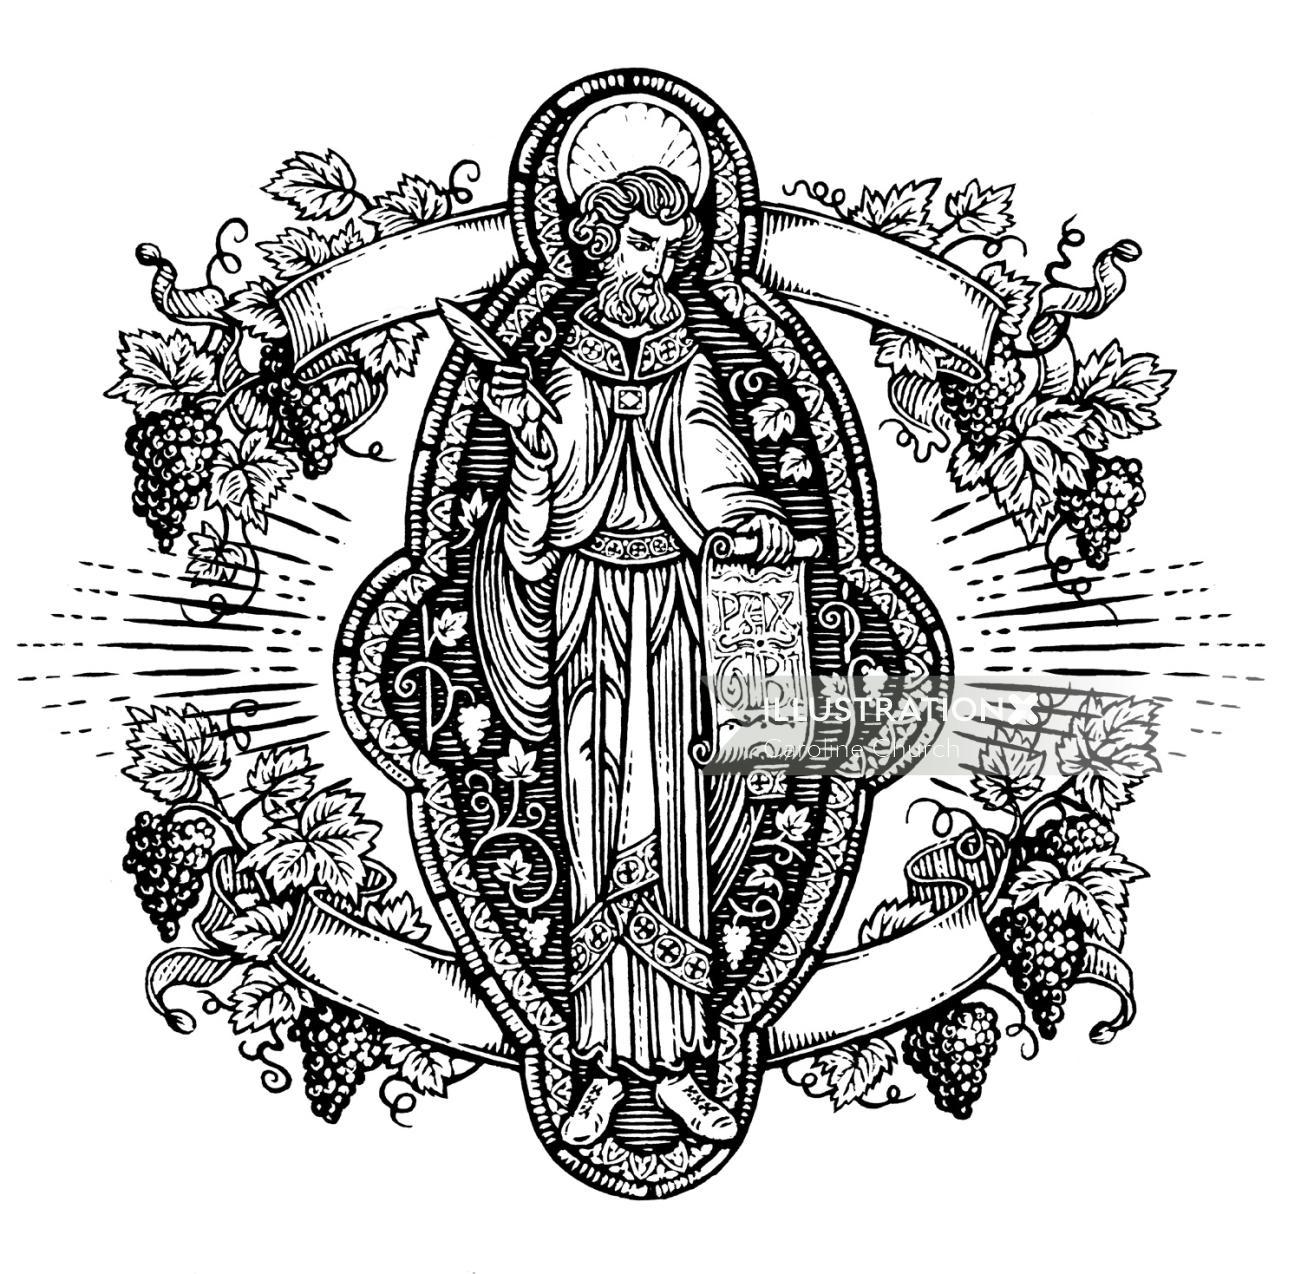 Historical illustration of christ